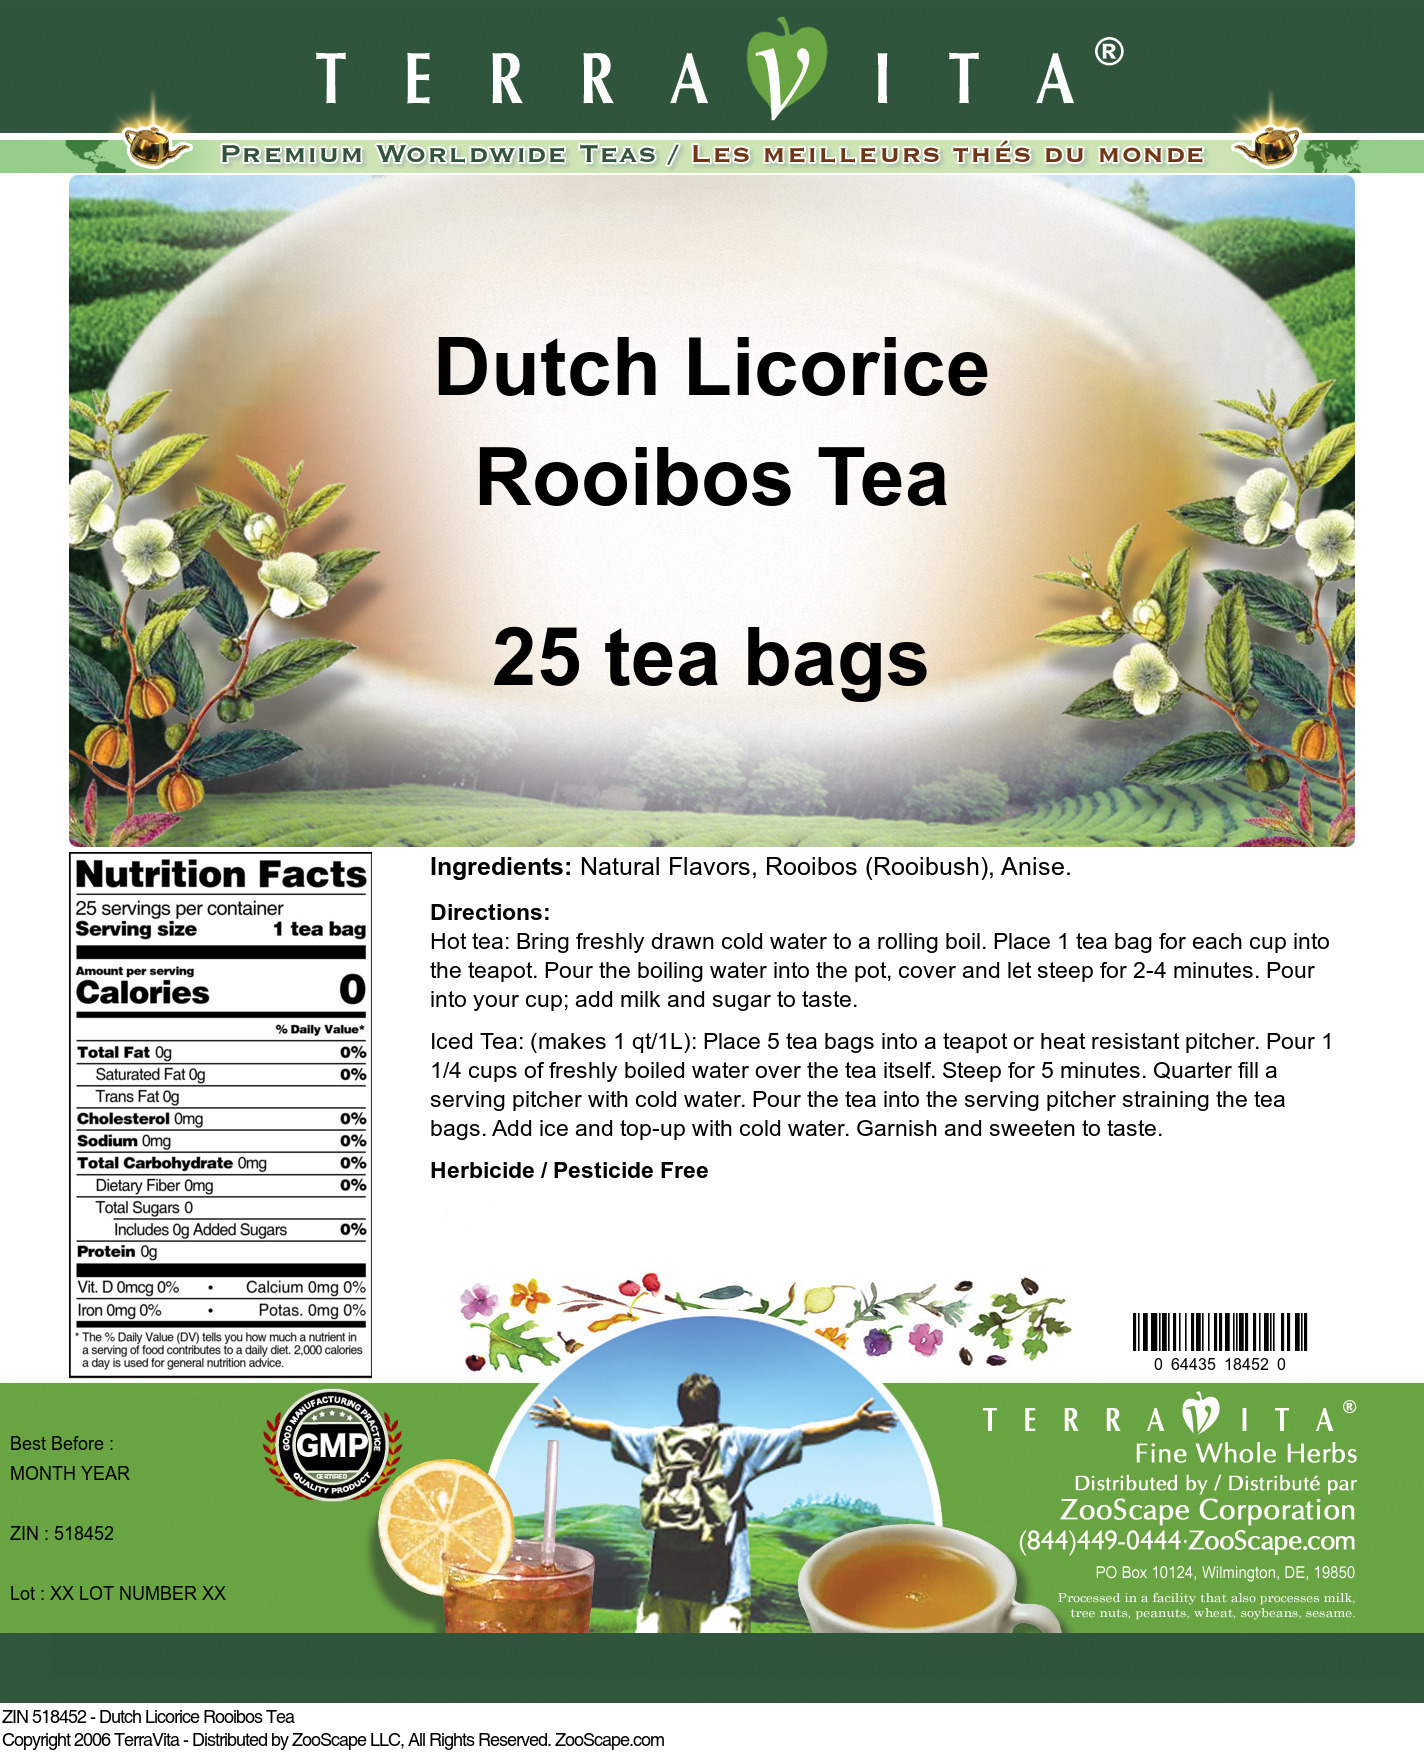 Dutch Licorice Rooibos